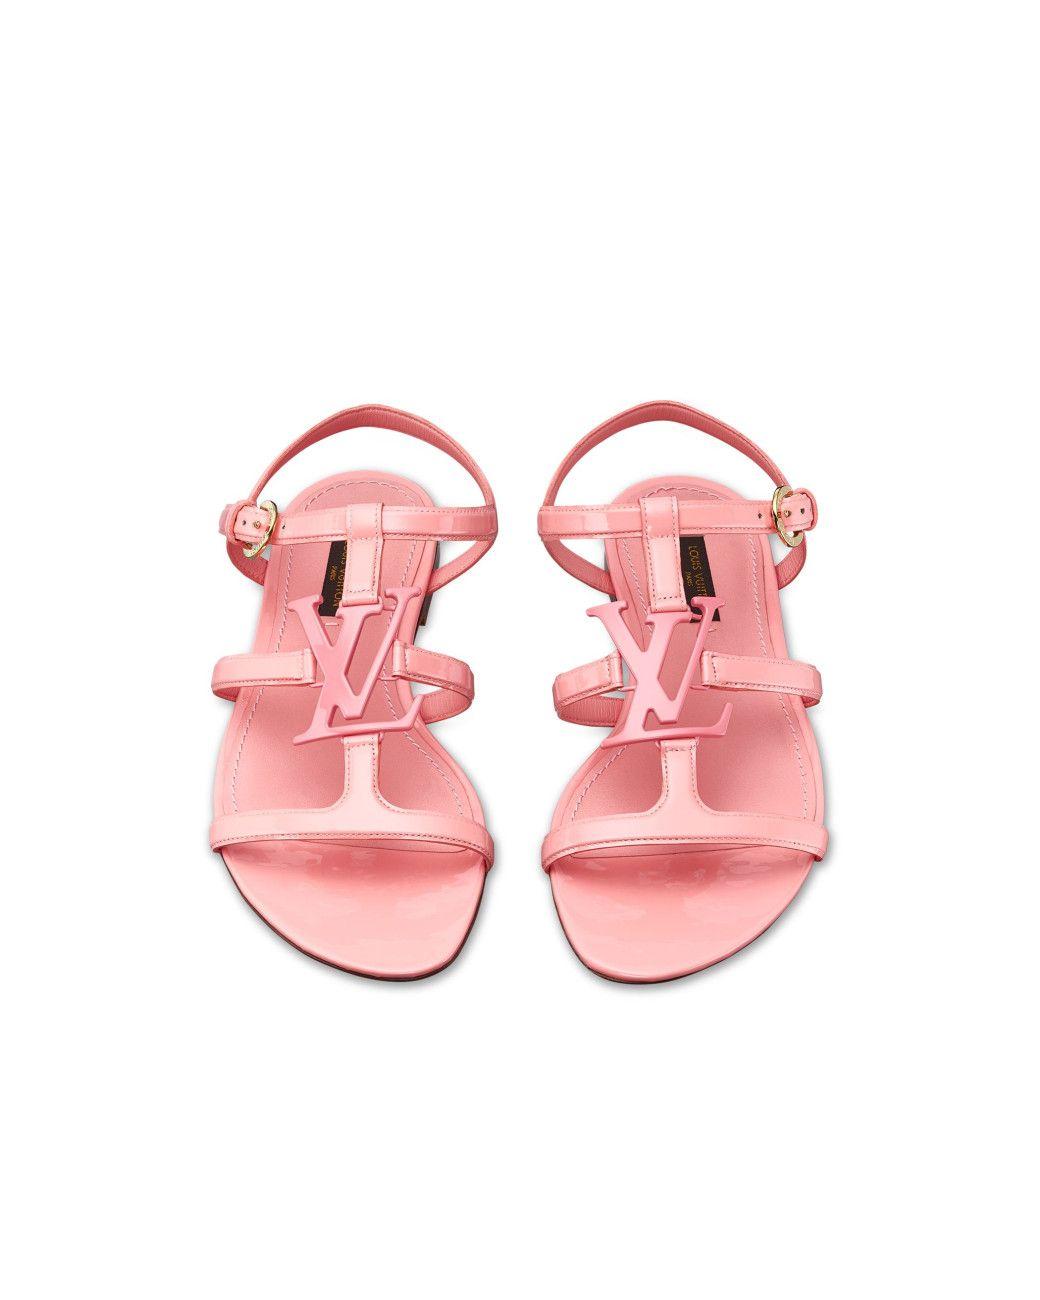 2e2ece7bac0a Louis Vuitton Women s Pink Paradiso Sandal ..... This eye-catching flat